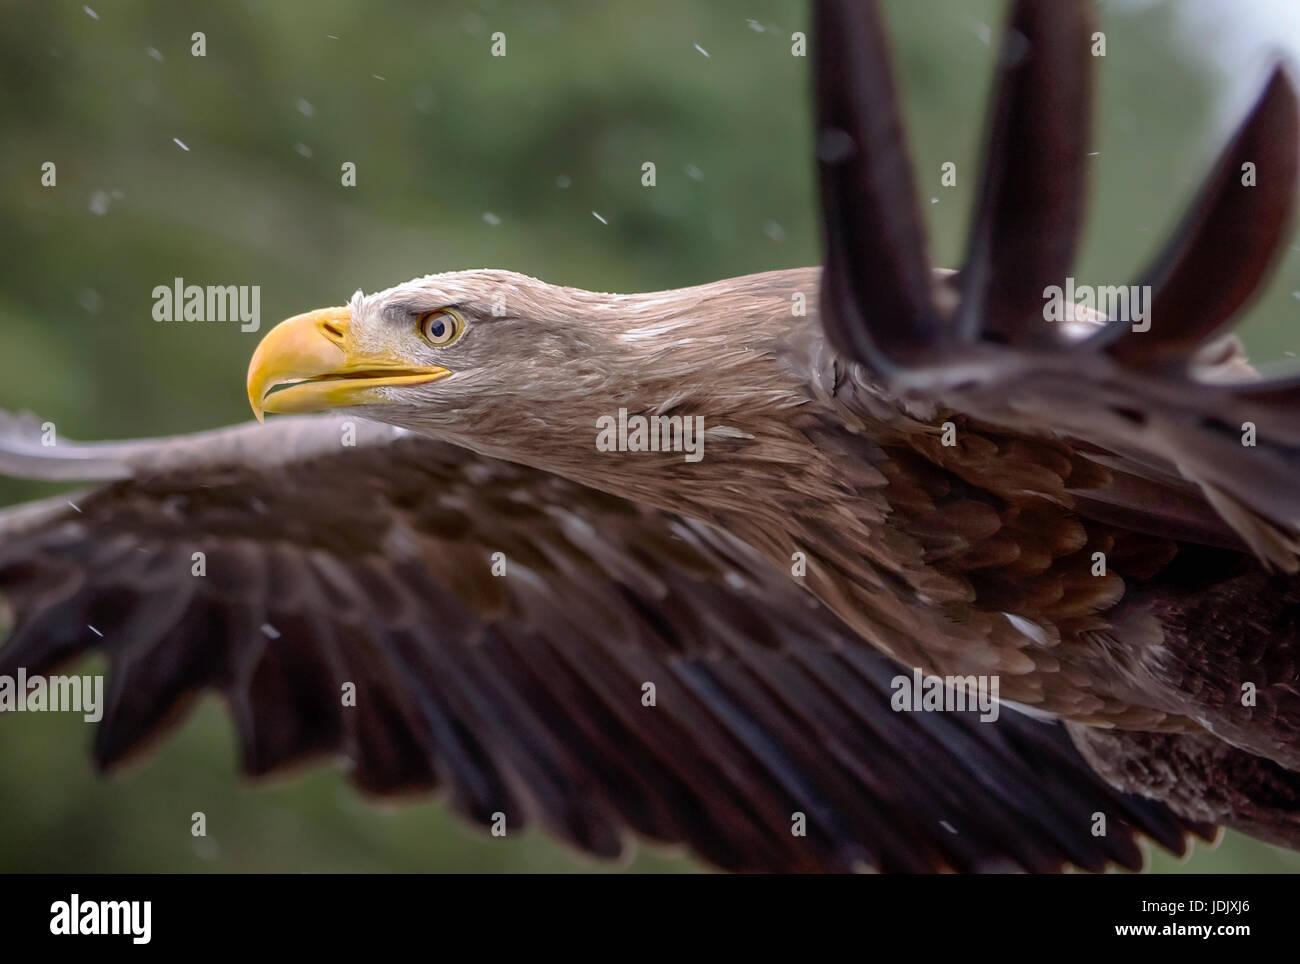 A White Tailed Sea Eagle in Flight Stock Photo